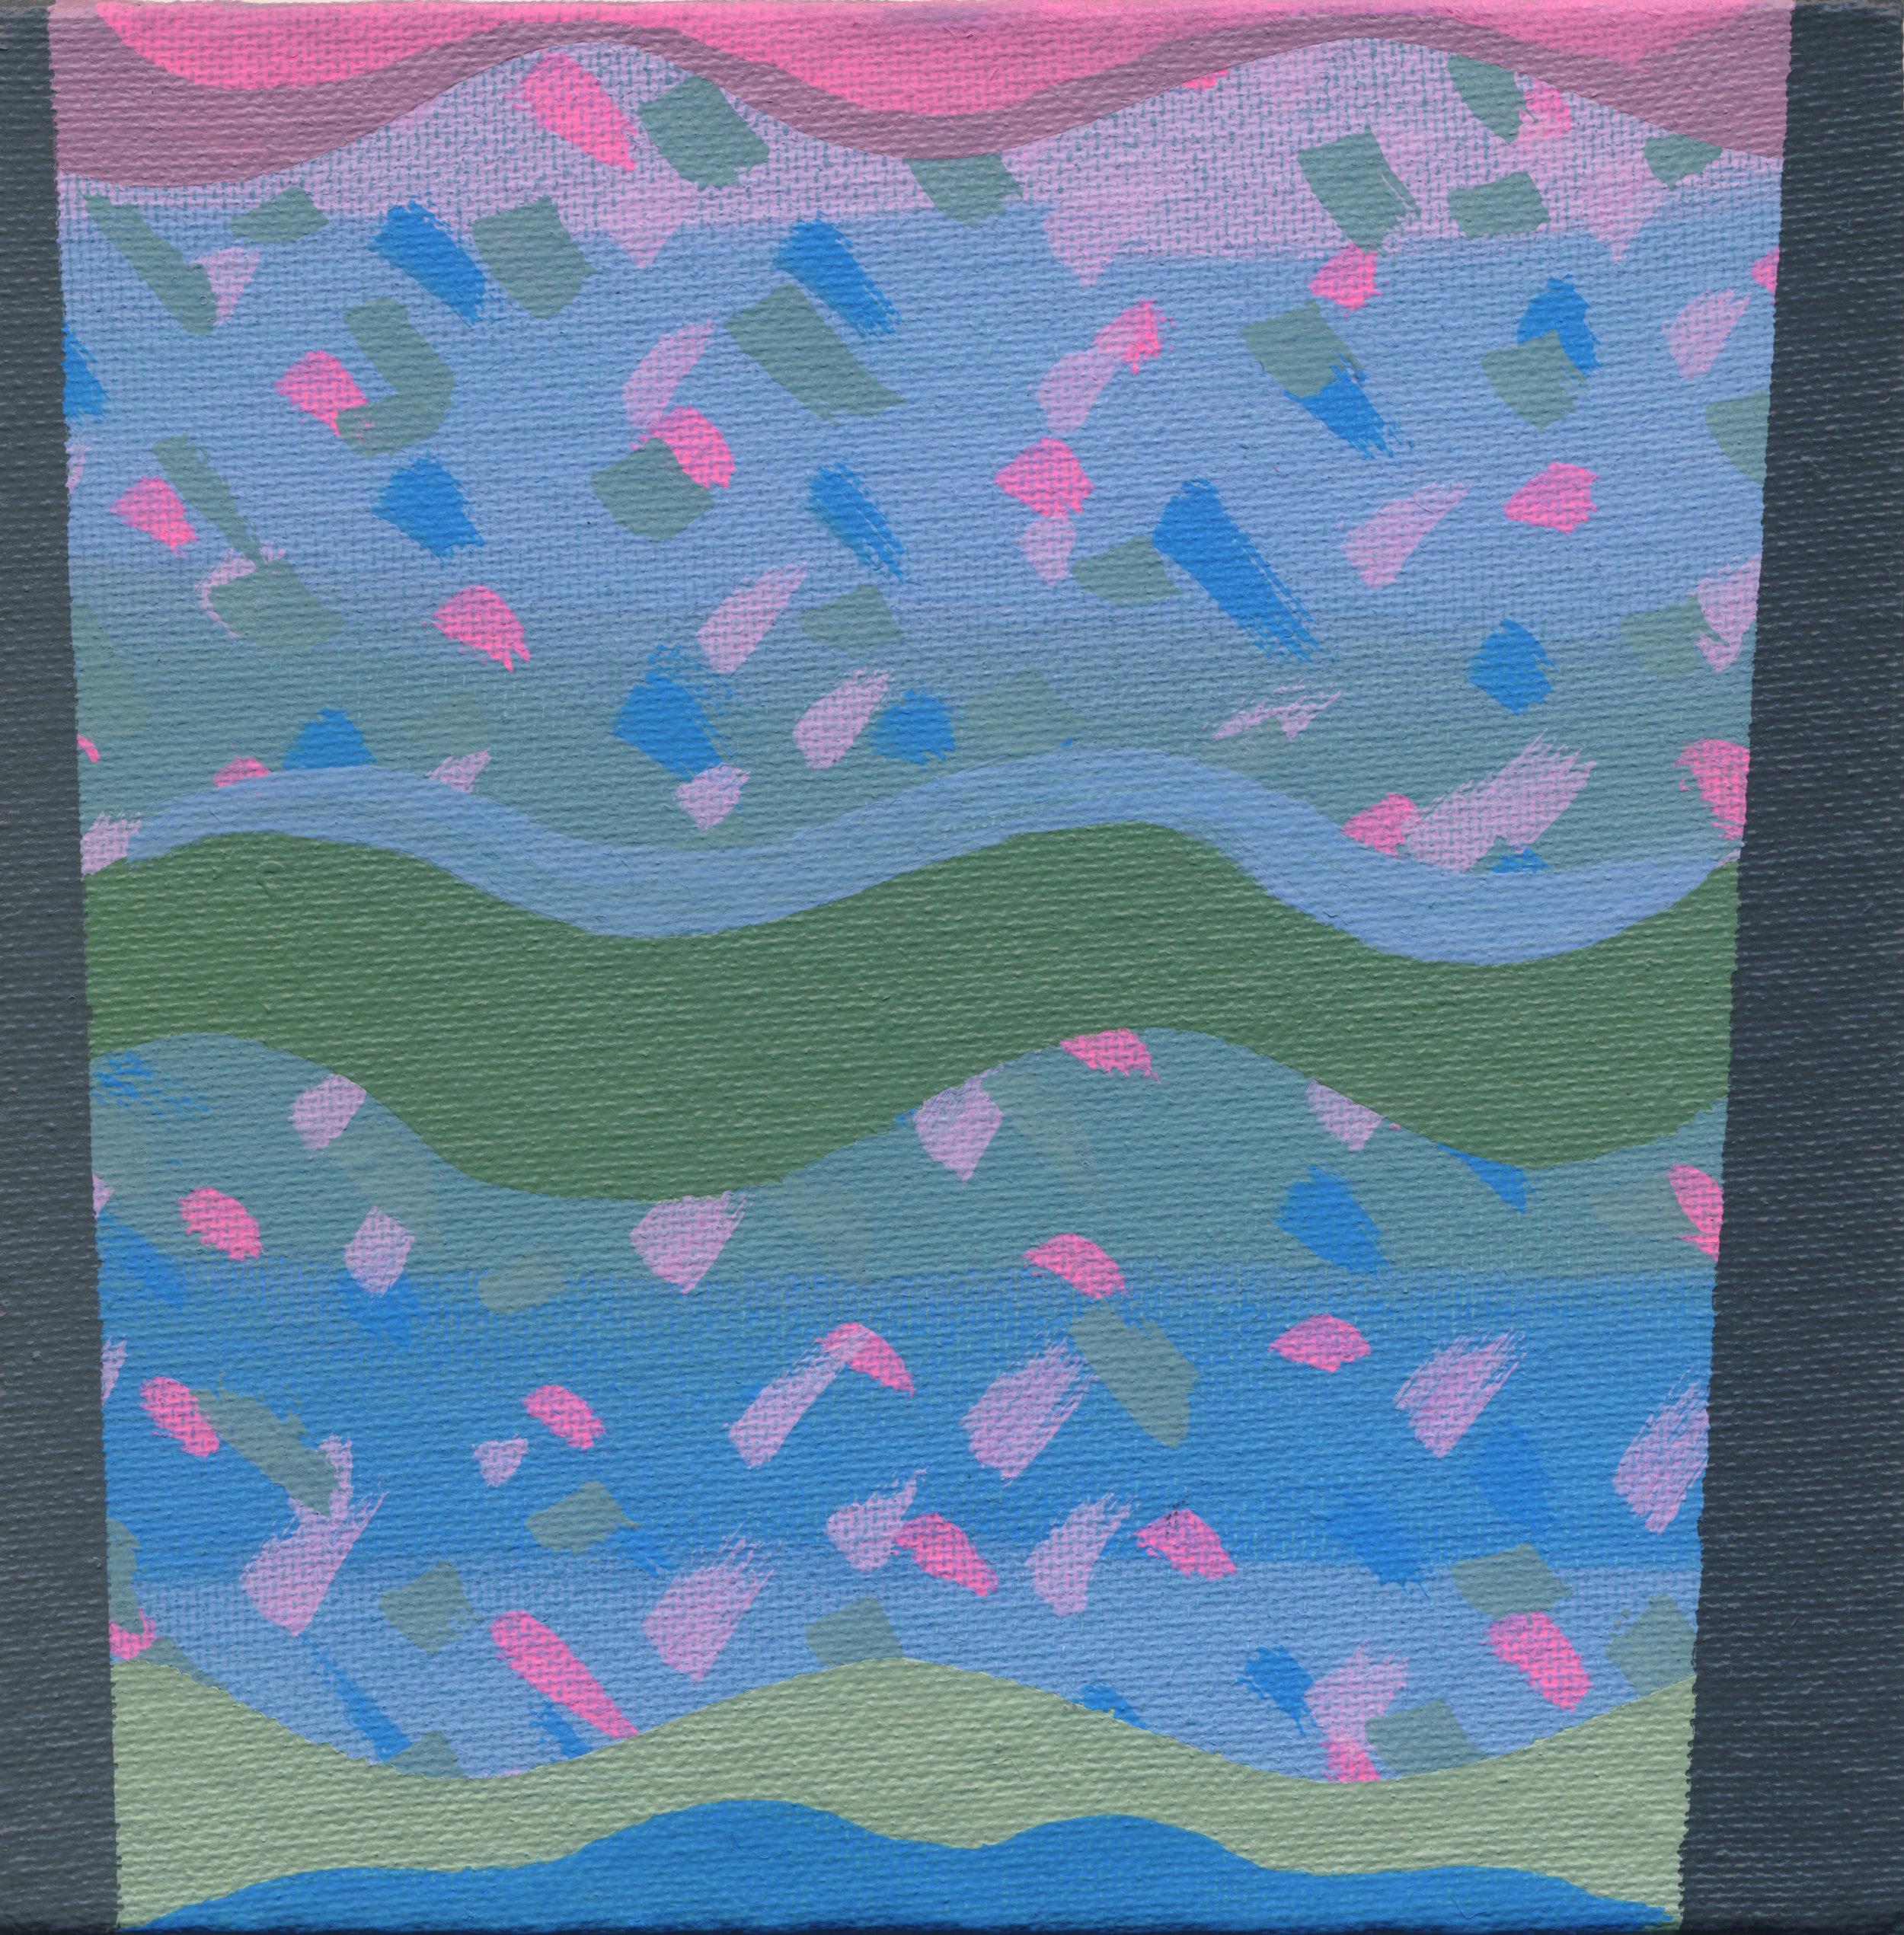 "2/100, Acrylic on canvas panel, 6"" X 6"", 1/8/19"